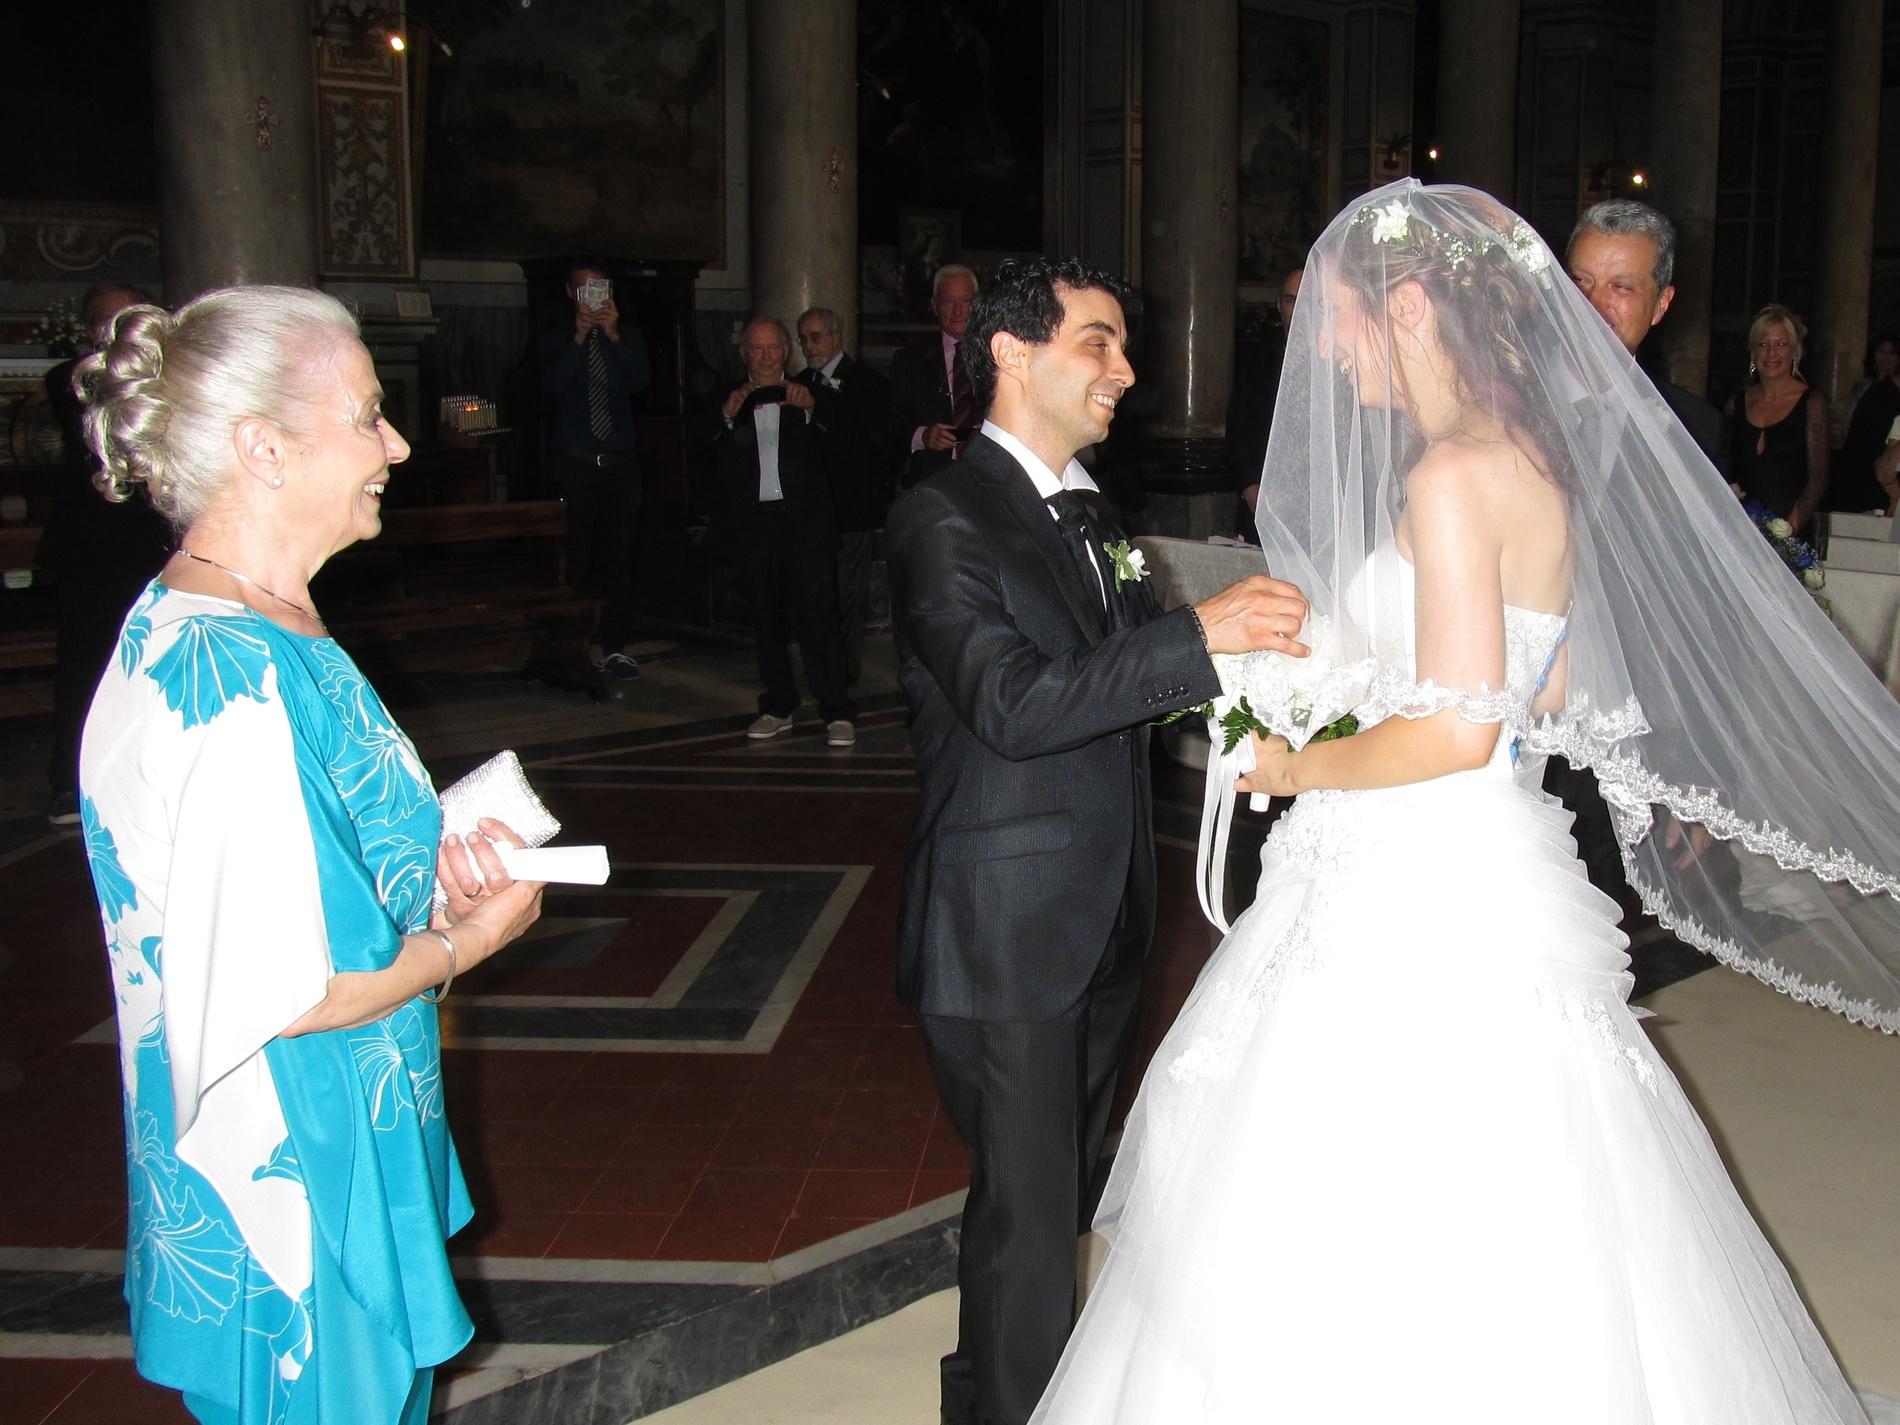 matrimonio-ilaria-torrisi-e-marco-di-lucia-2015-08-08-15-30-15